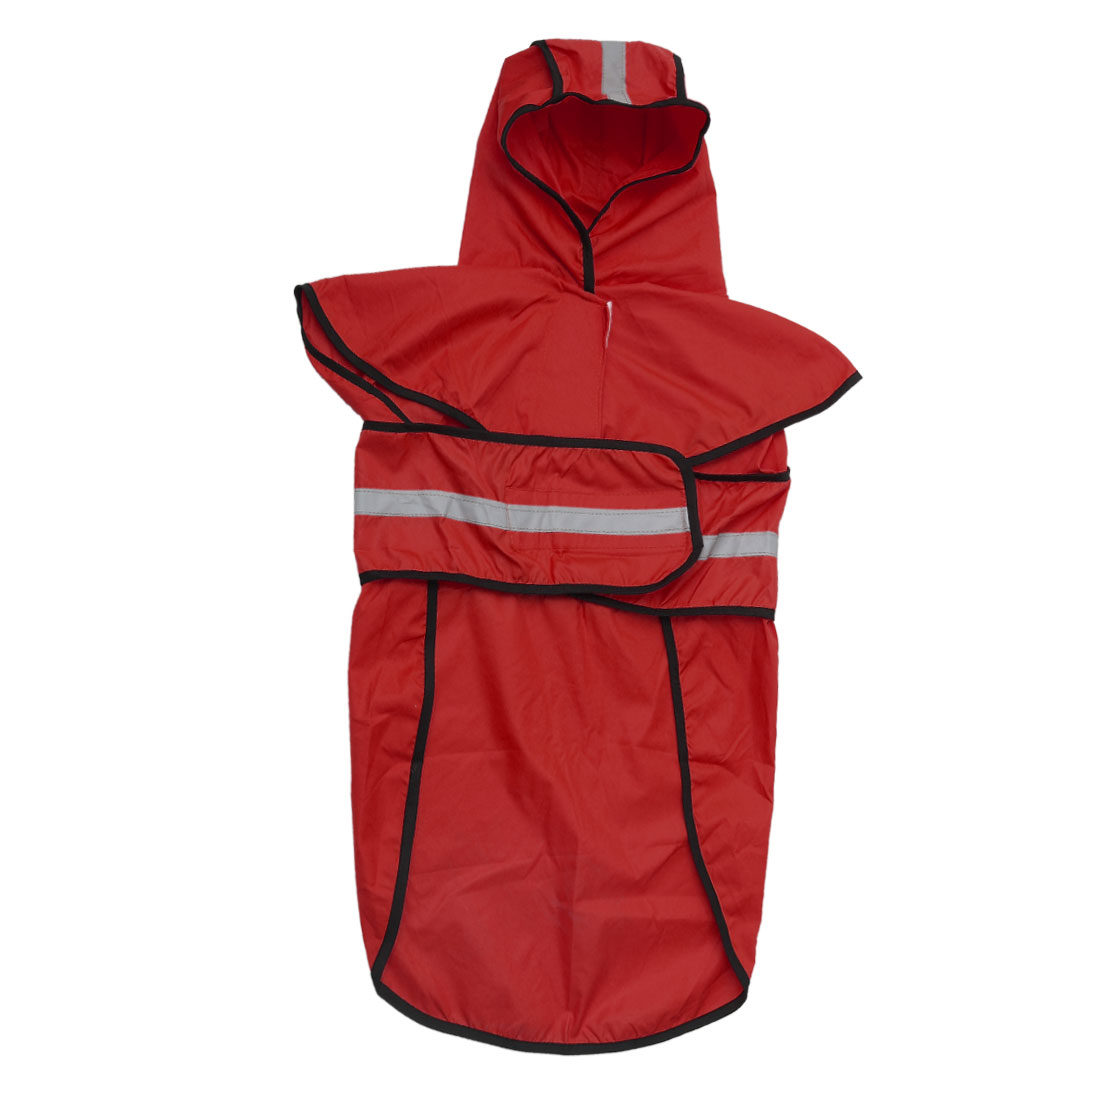 Pet Dogs Raincoat Rain Jacket Poncho Cloth Water-resistant Rainwears Red 3XL